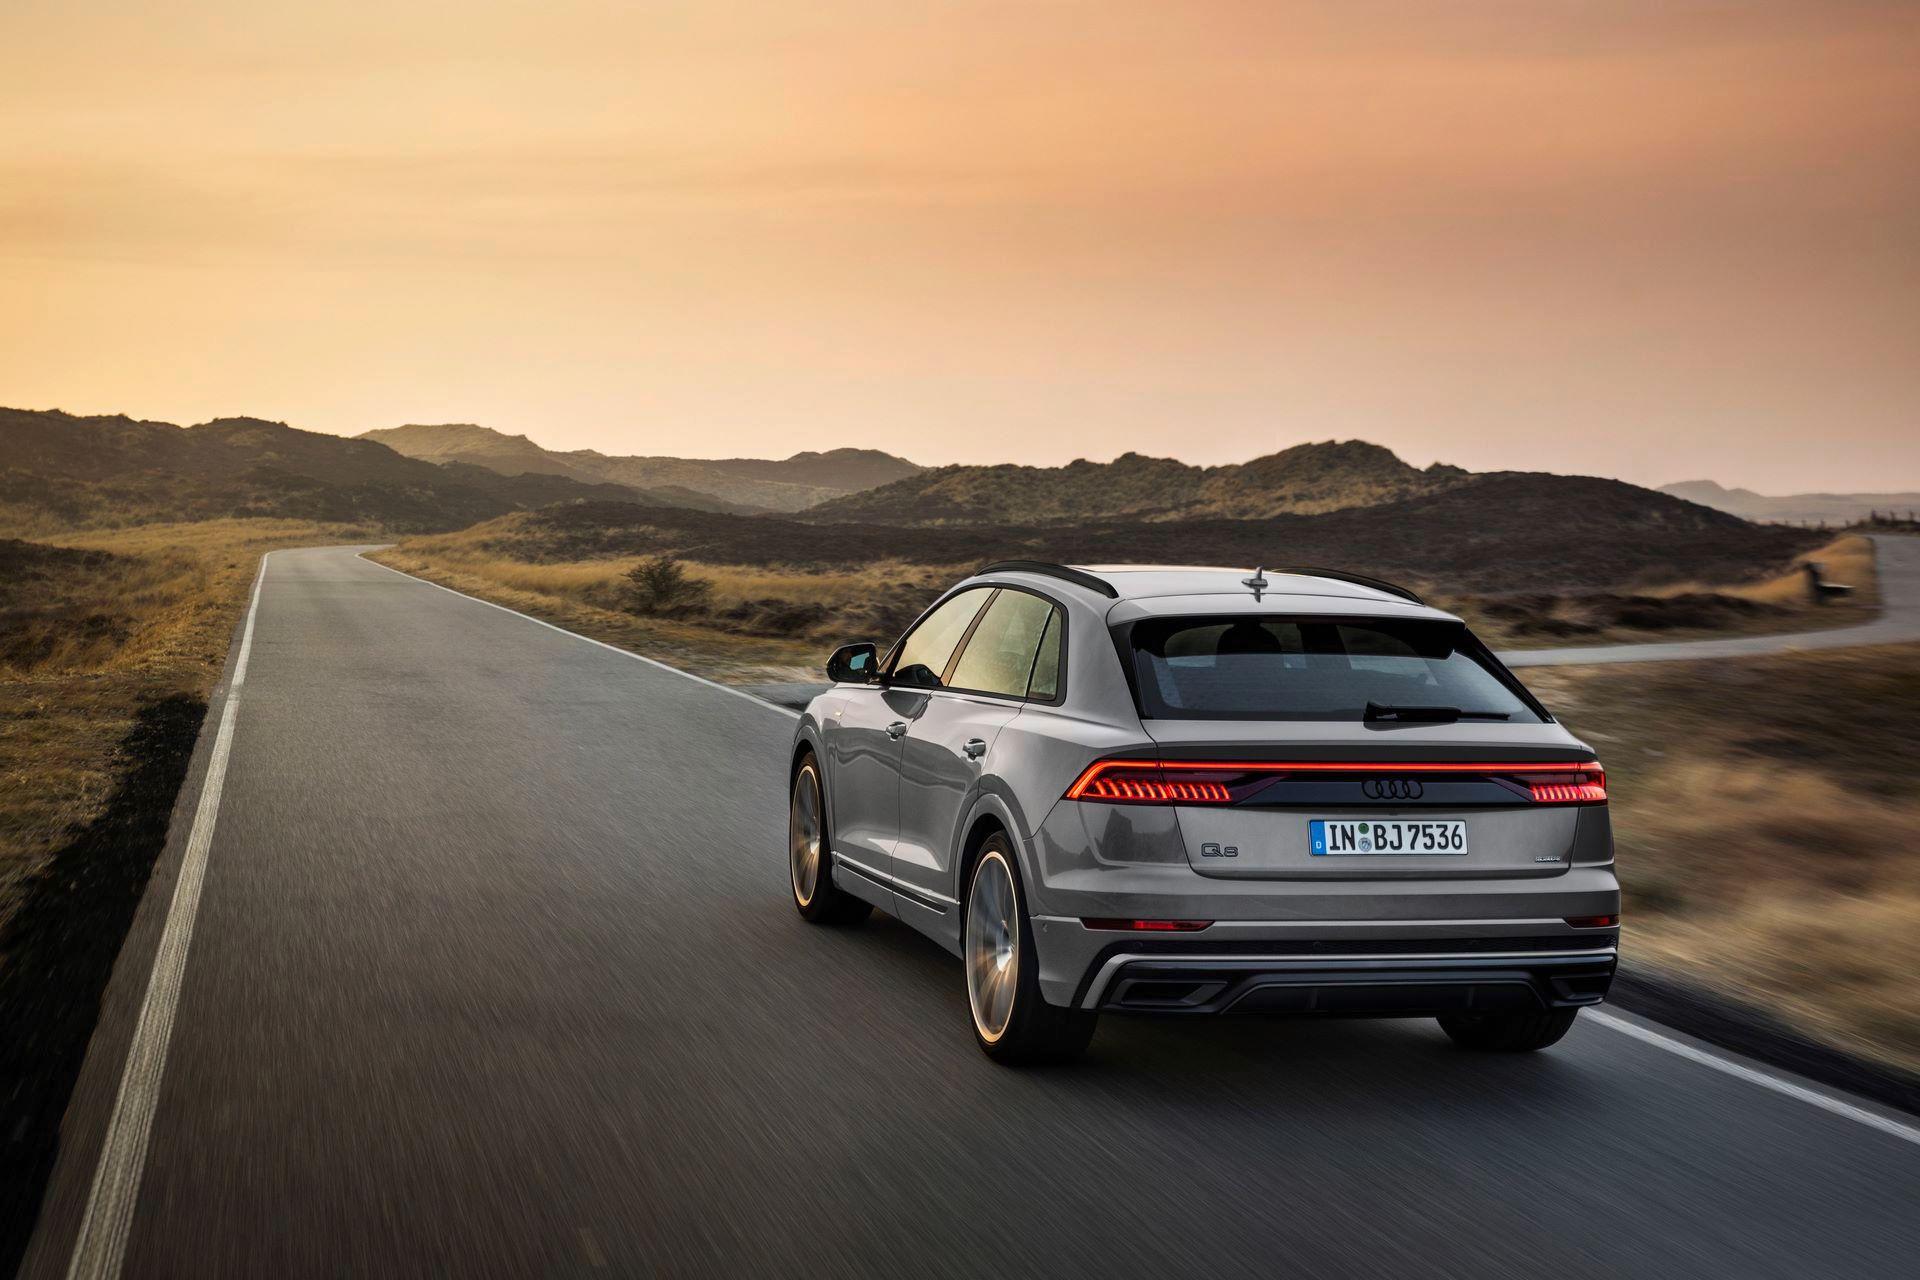 Audi-A4-A5-Q7-Q8-Competition-And-Competition-Plus-Trims-26